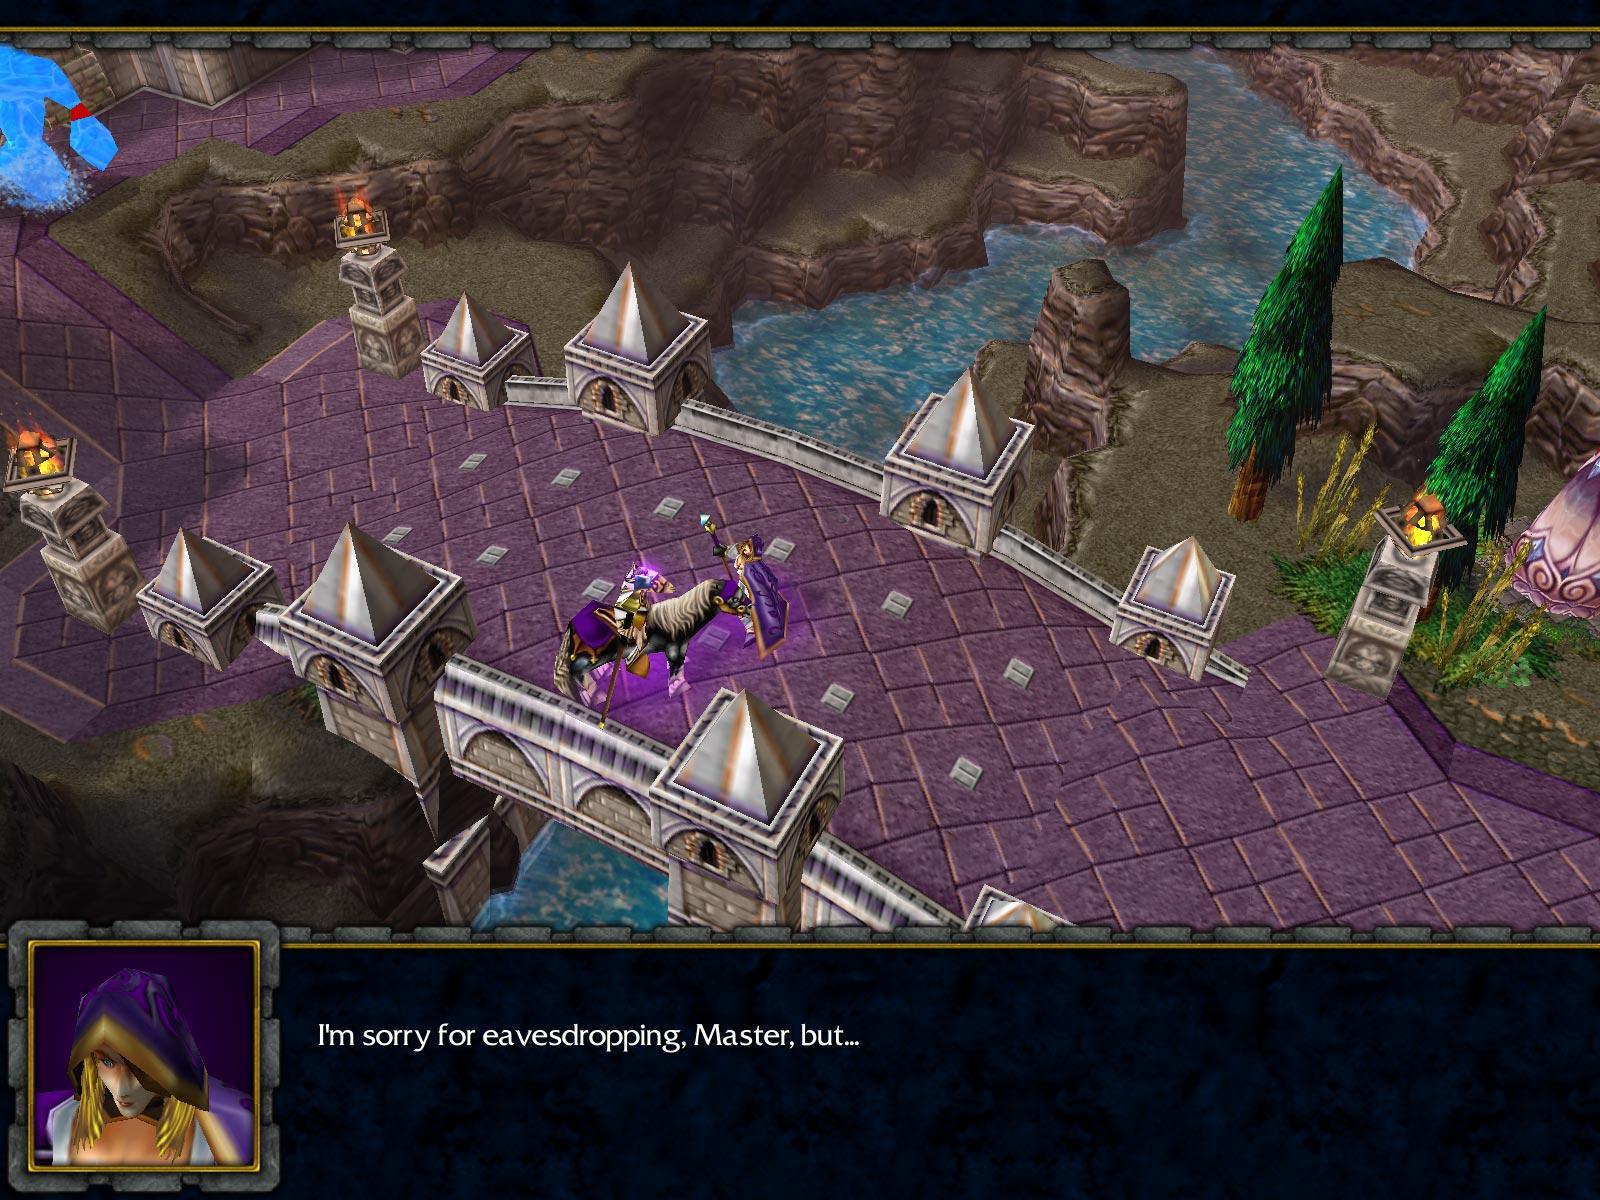 Warcraft sexmap download hentai video